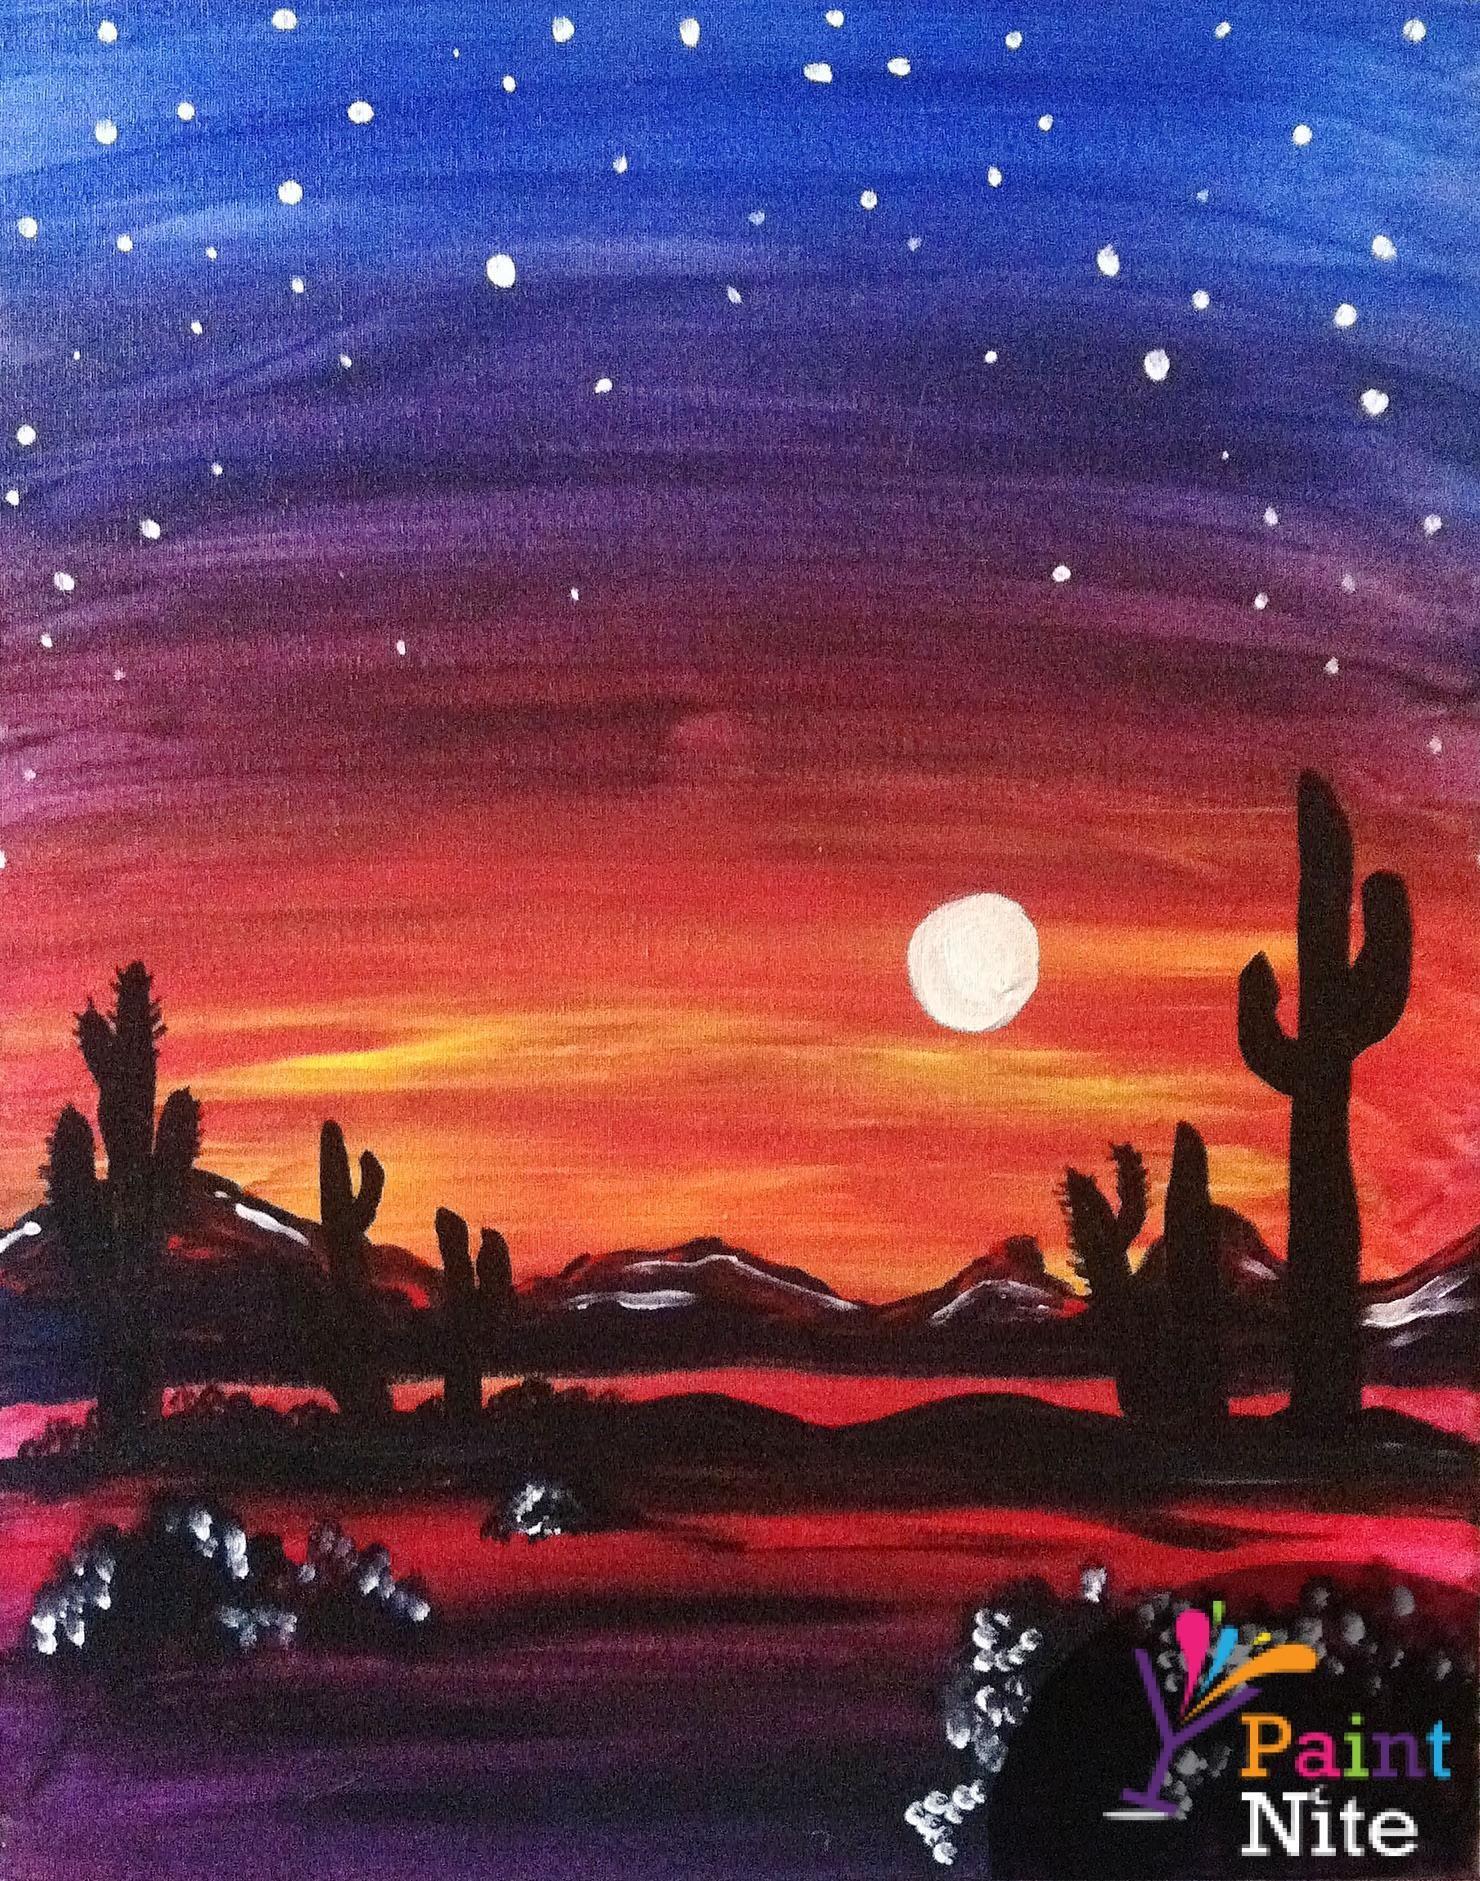 Paint Nite Vegas Shucks Tavern Flamingo 10 06 2015 Paint Nite Pinterest Painting Watercolor Paintings And Art